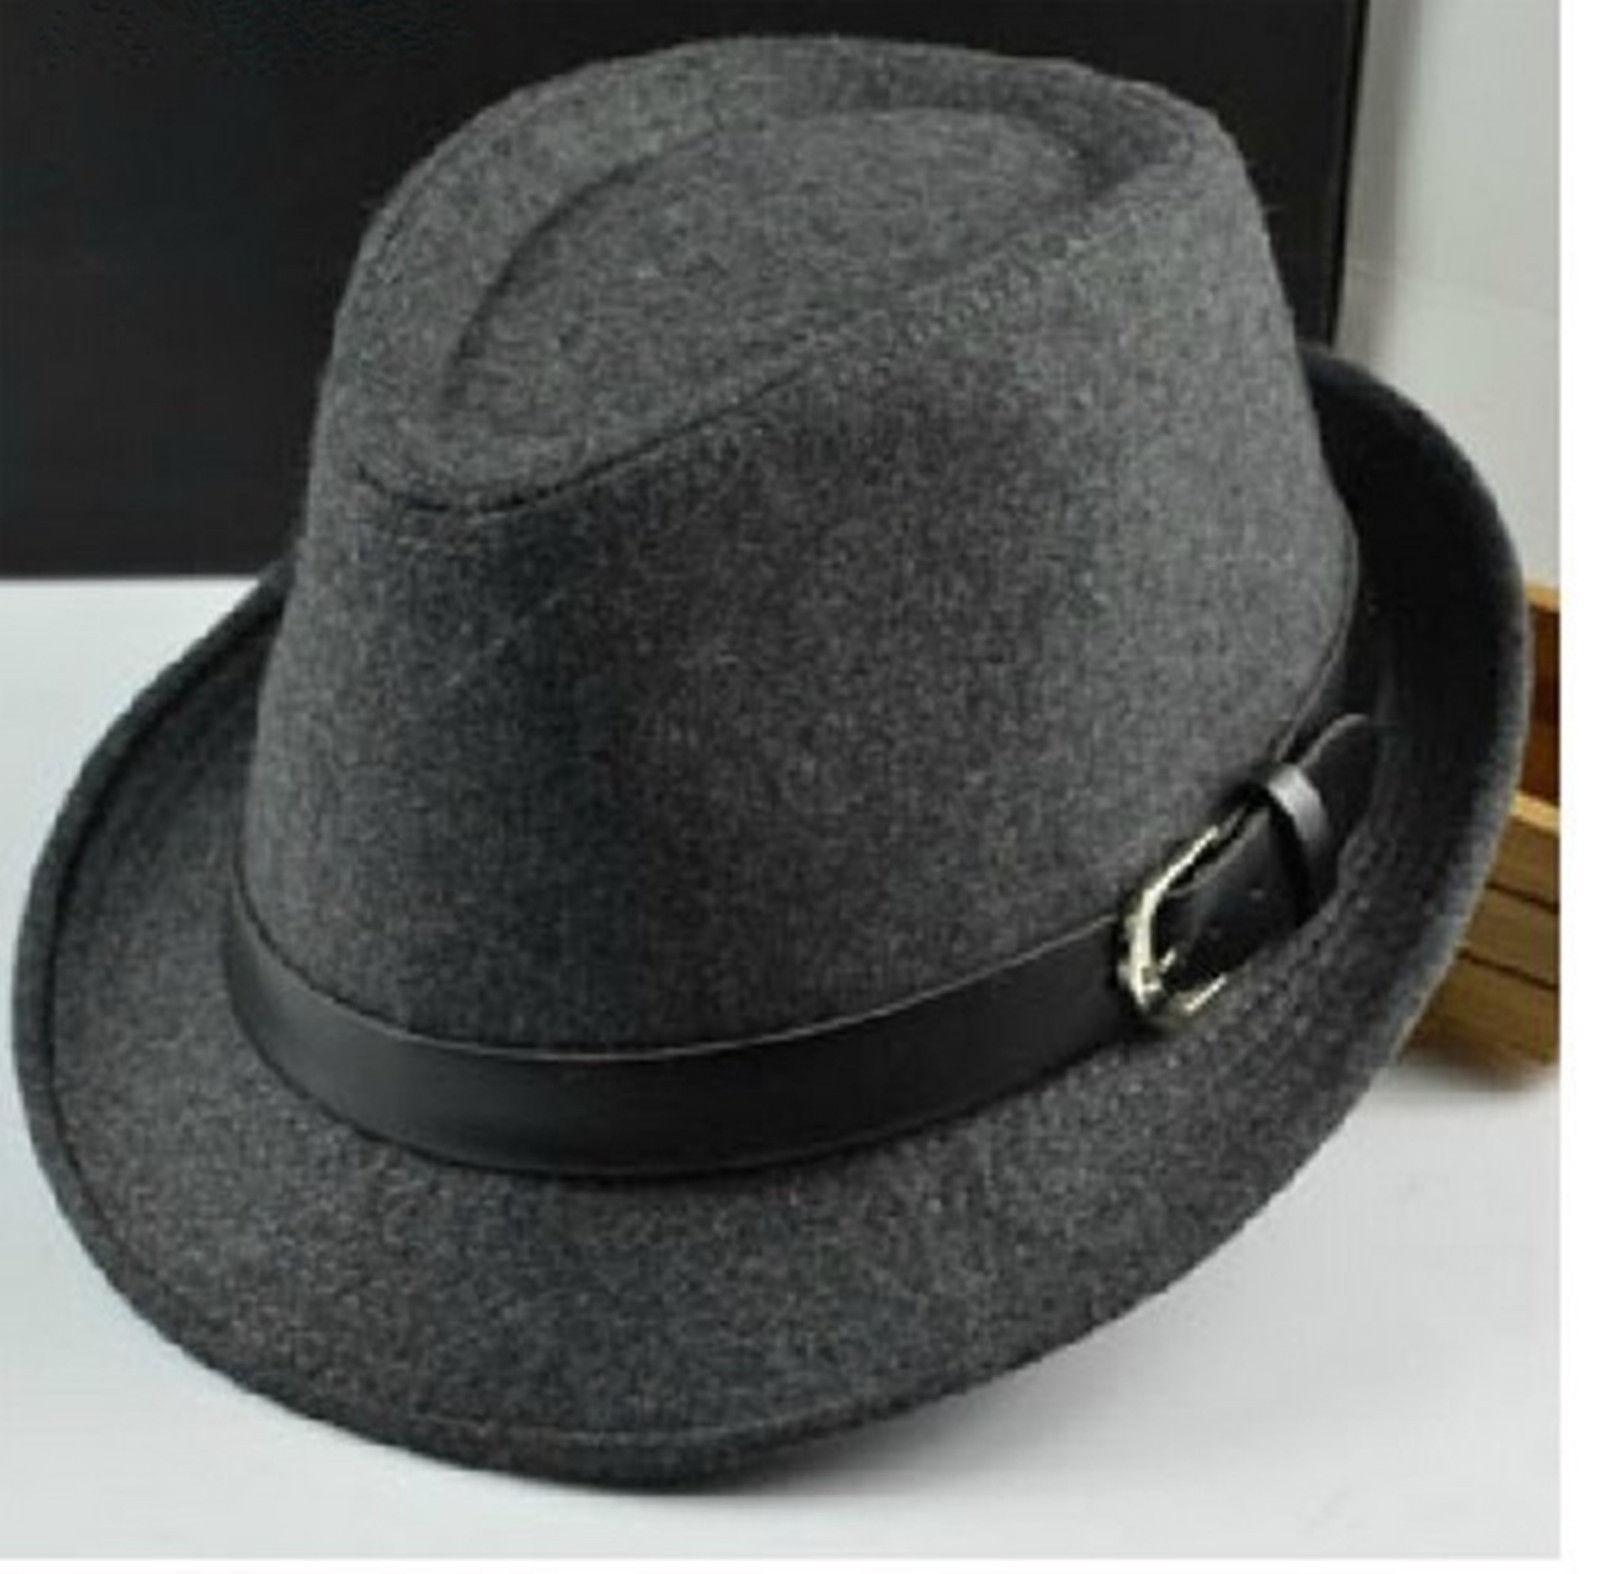 New Unisex Fedora Panama Trilby Jazz Wool Irregular Hat Homburg Cap | eBay